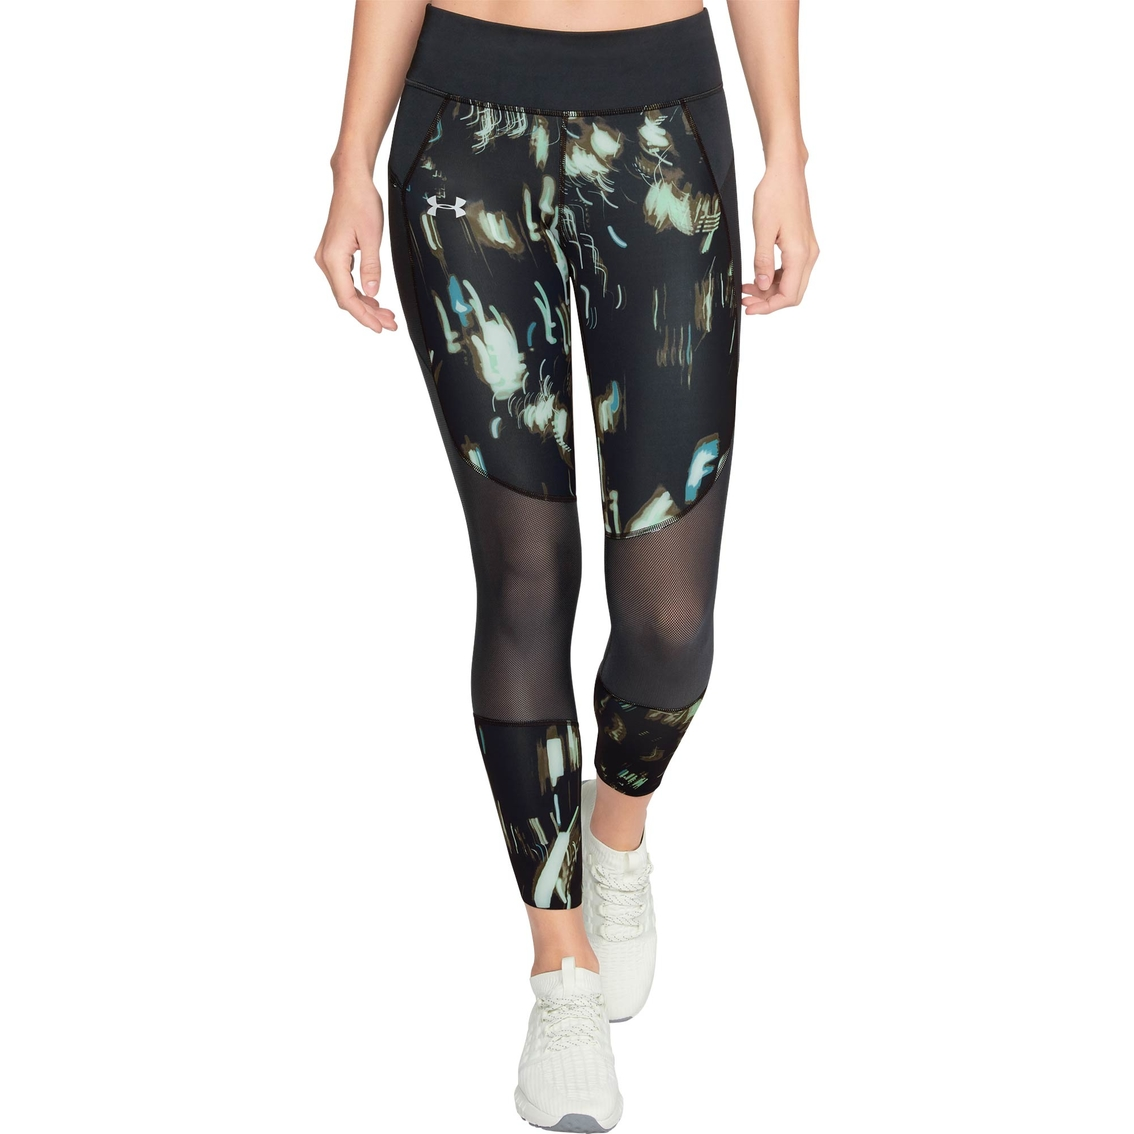 Camino armario factor  Under Armour Speedpocket Printed Run Crop Pants   Pants & Capris   Clothing  & Accessories   Shop The Exchange